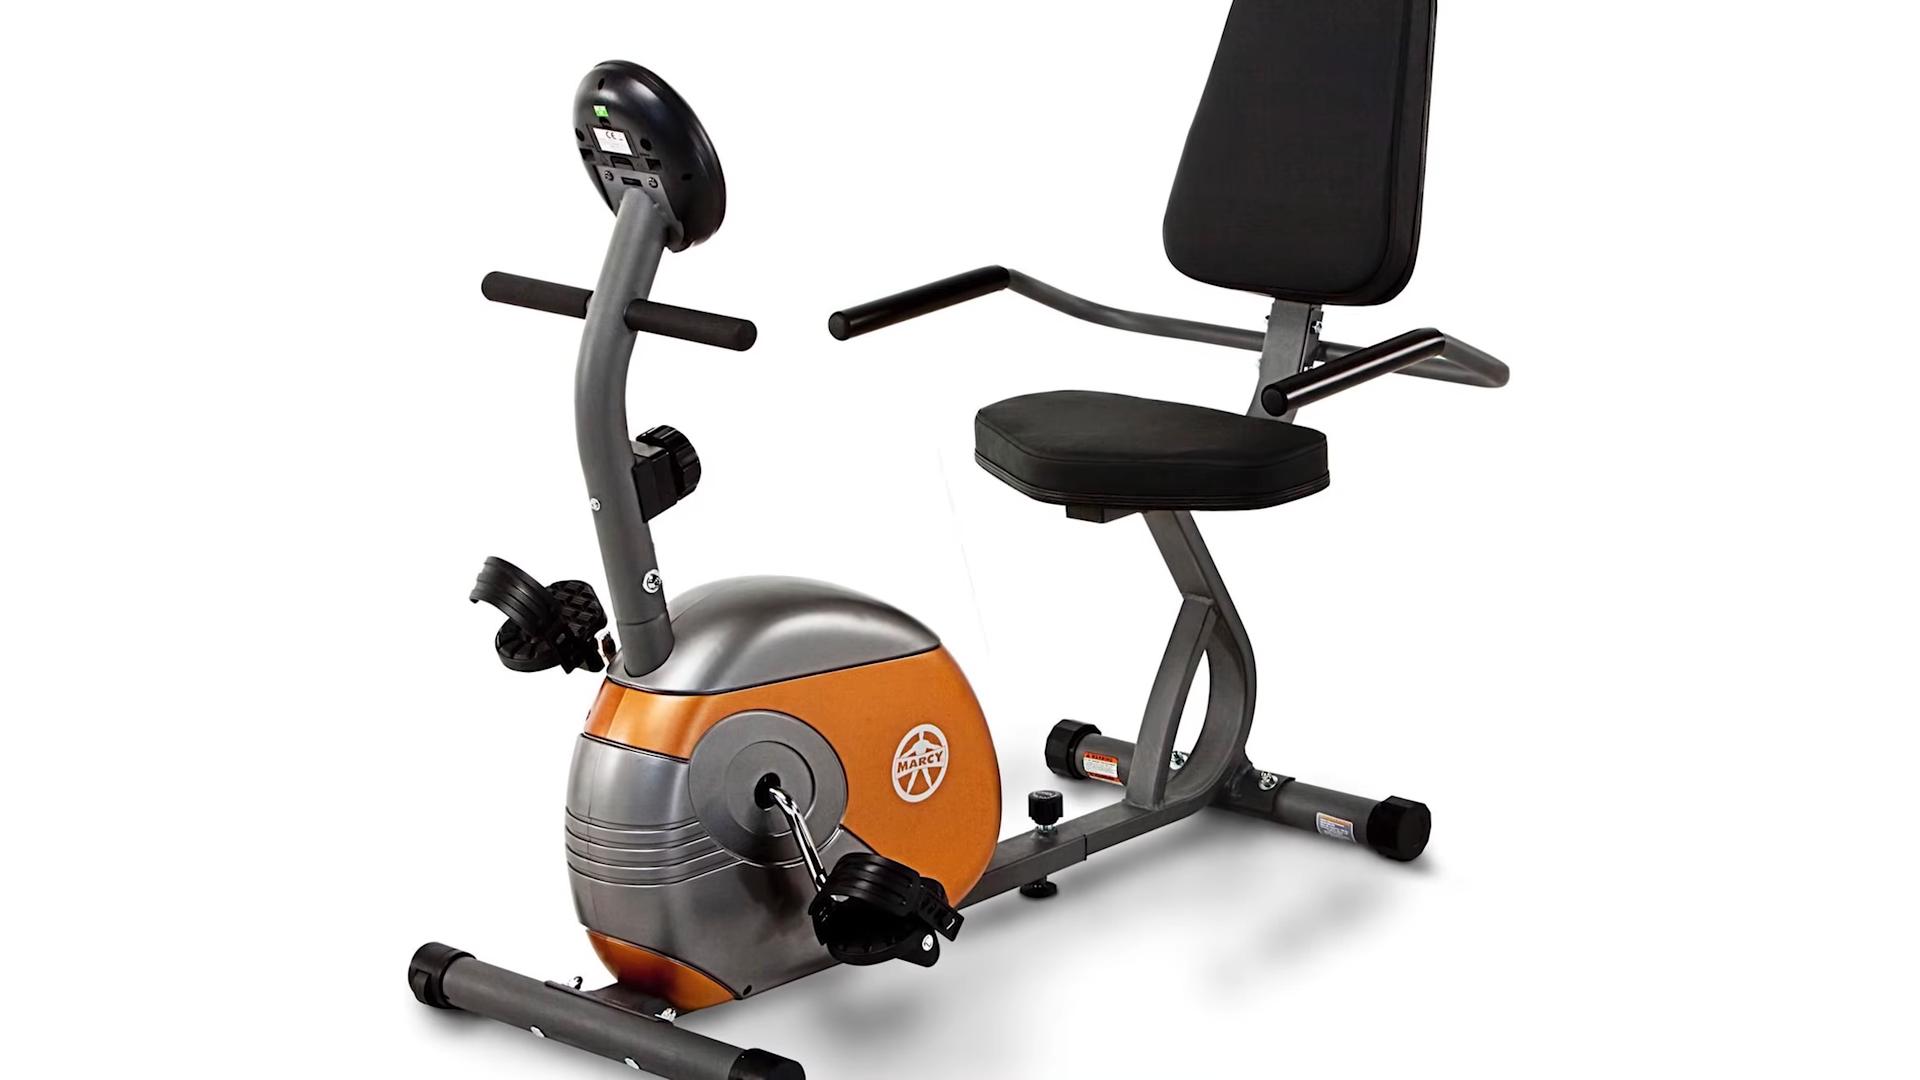 Schwinn Free Runner Sc368 Best Exercise Bike Recumbent Bike Workout Biking Workout